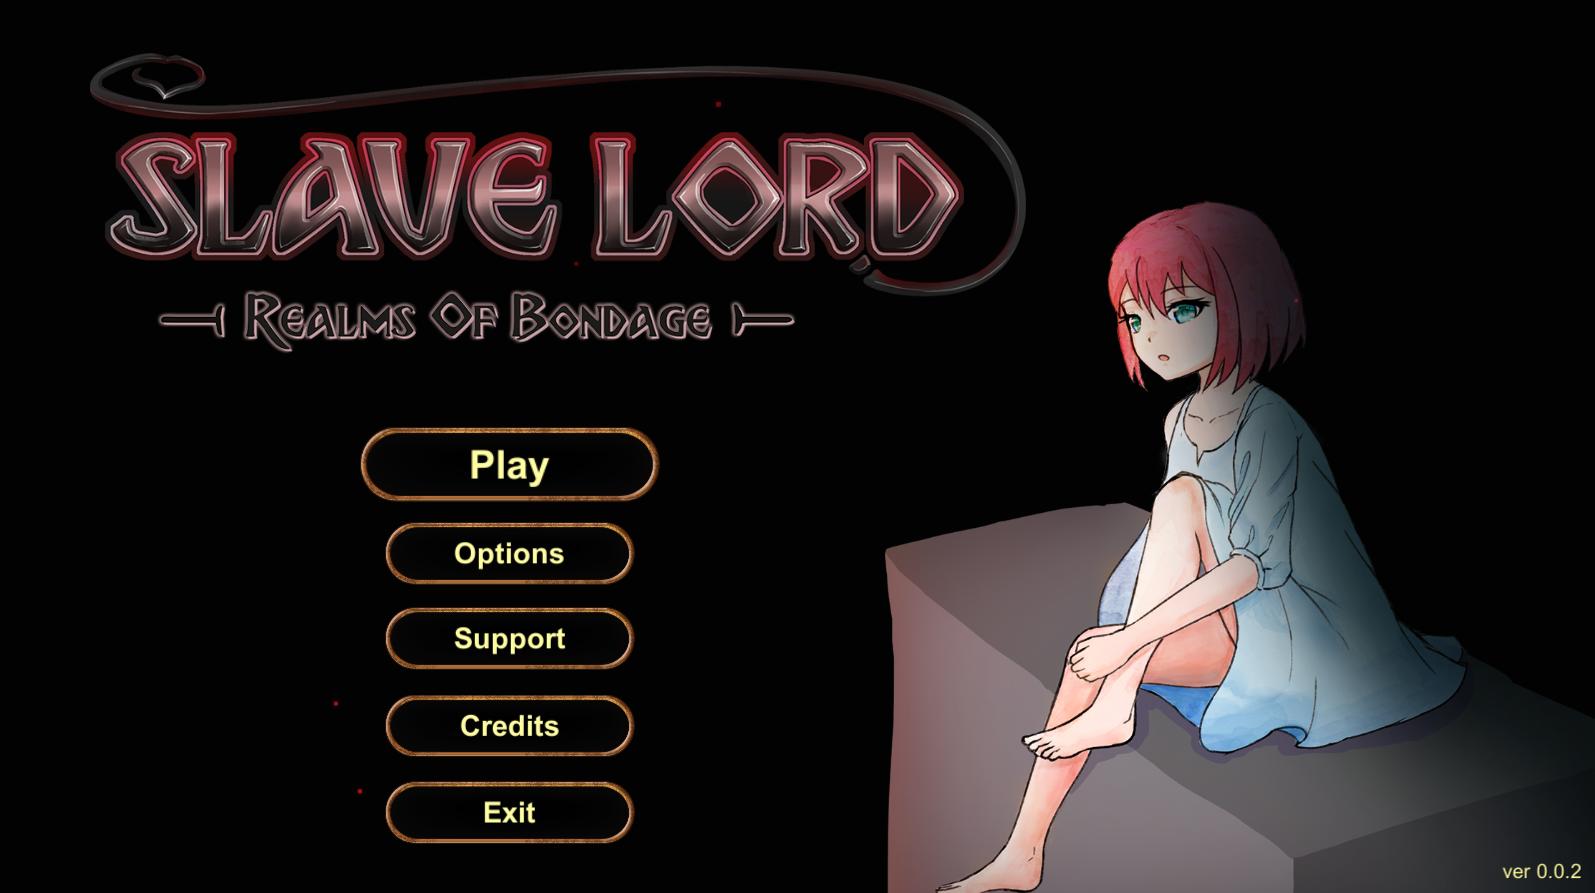 Slave Lord – Realms of Bondage (v0.0.3)